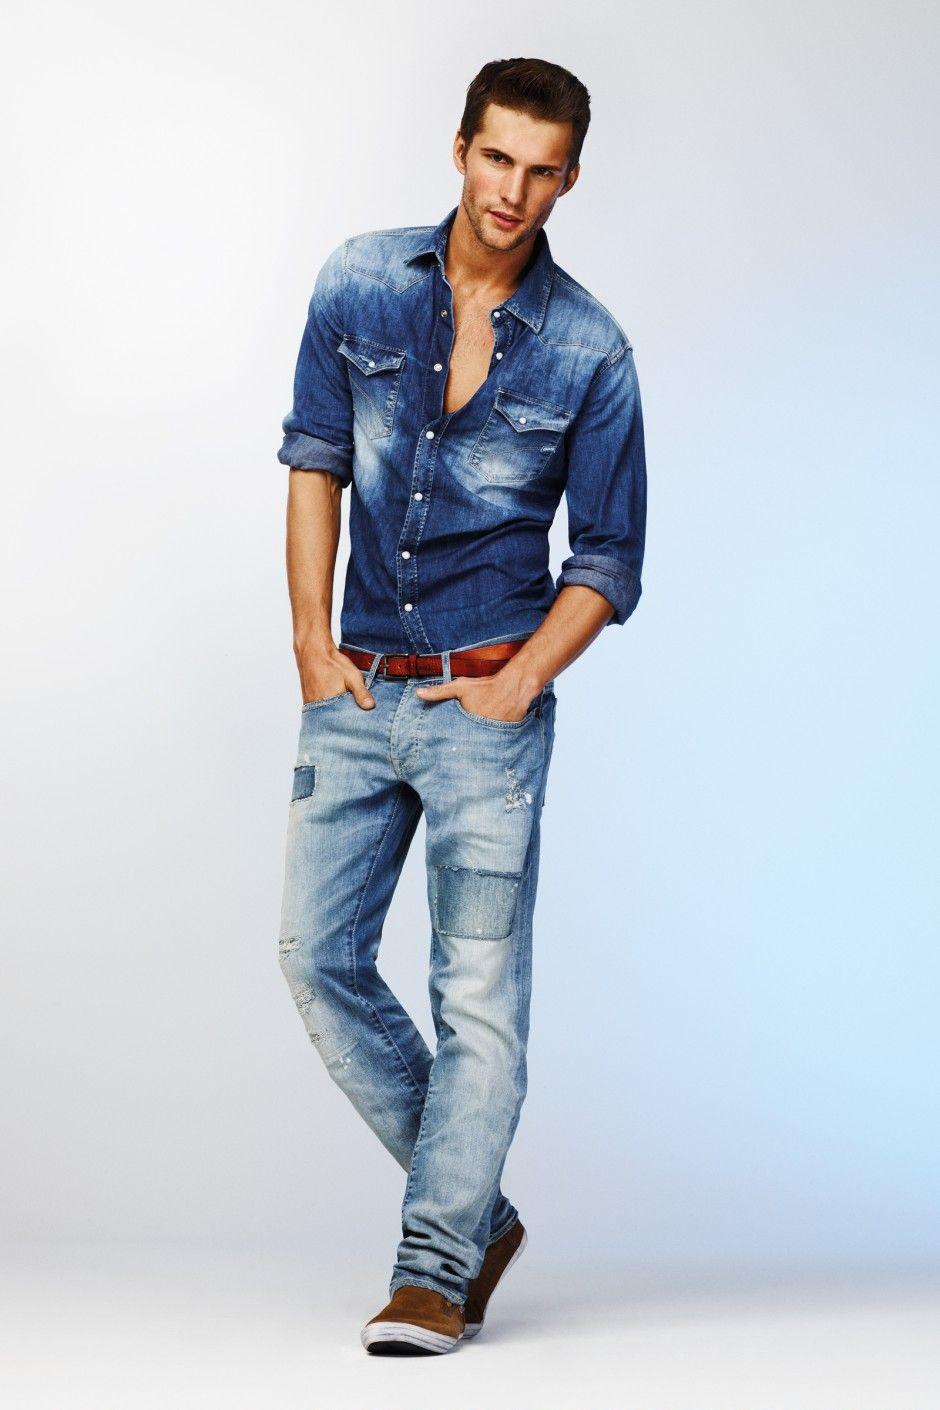 TOTAL DENIM - Gas Jeans☆